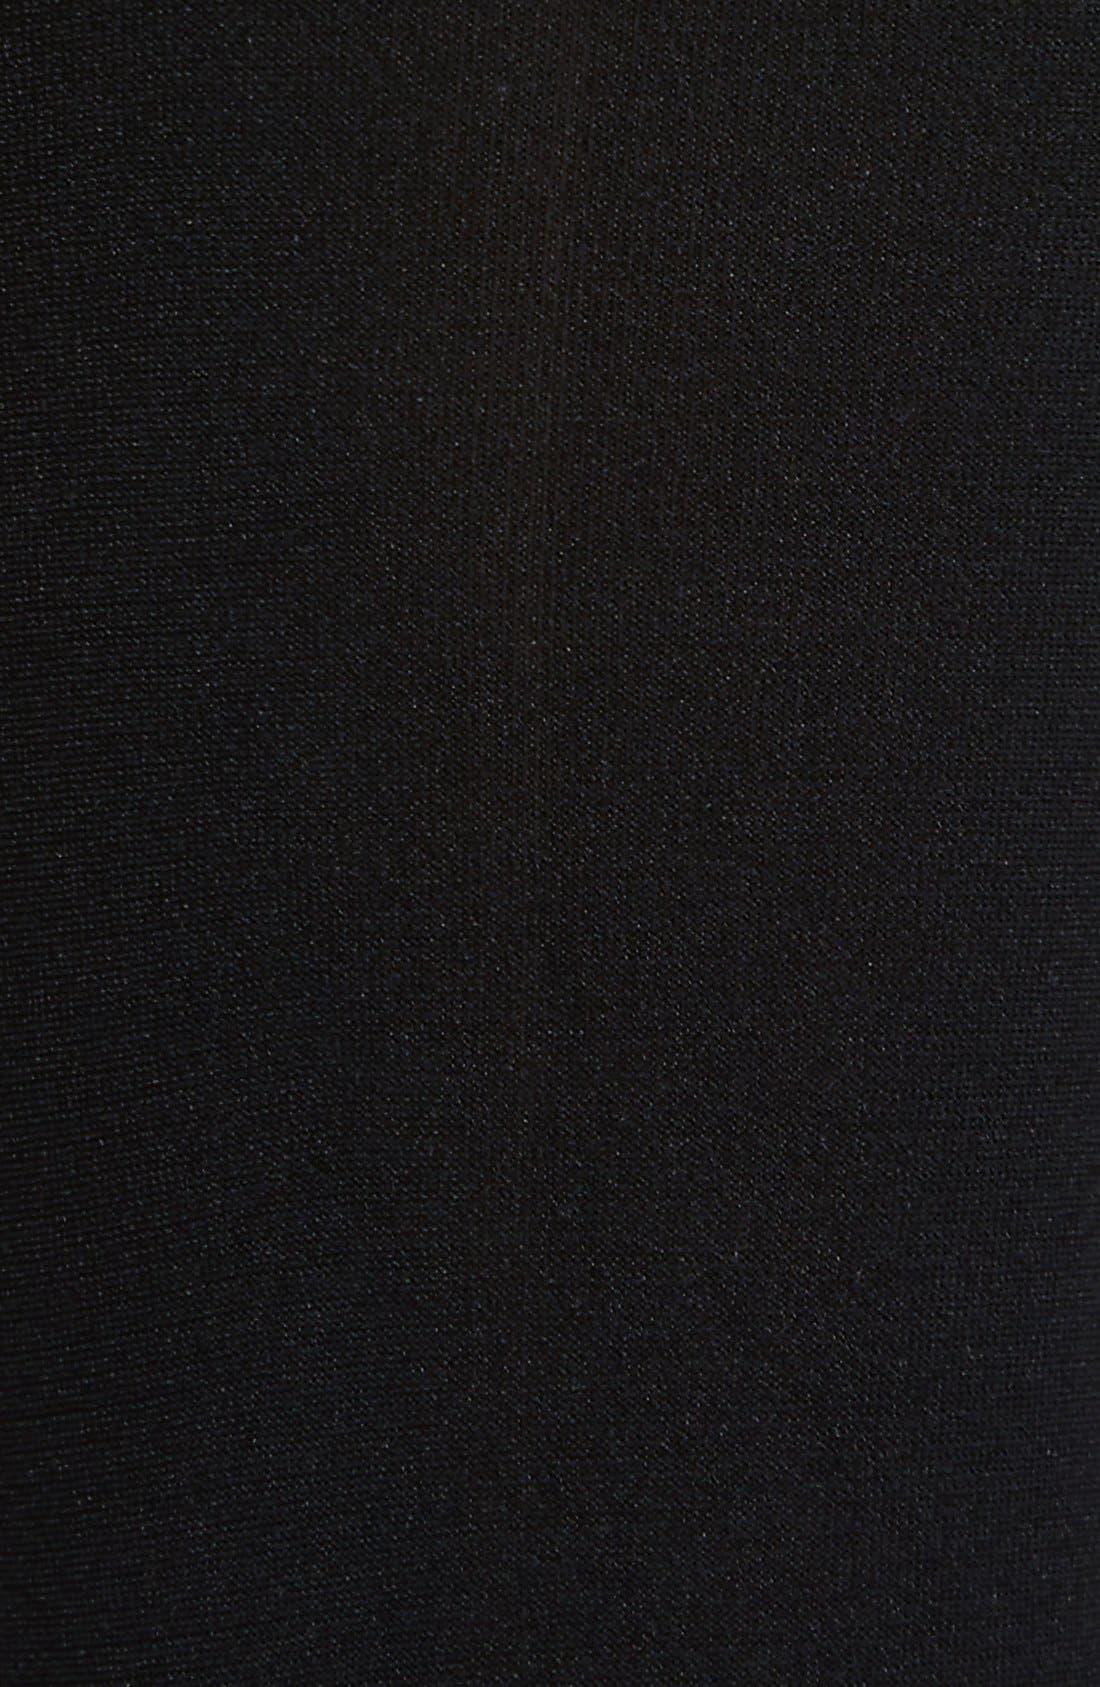 COMMANDO, Up All Night Thigh High Socks, Alternate thumbnail 3, color, BLACK